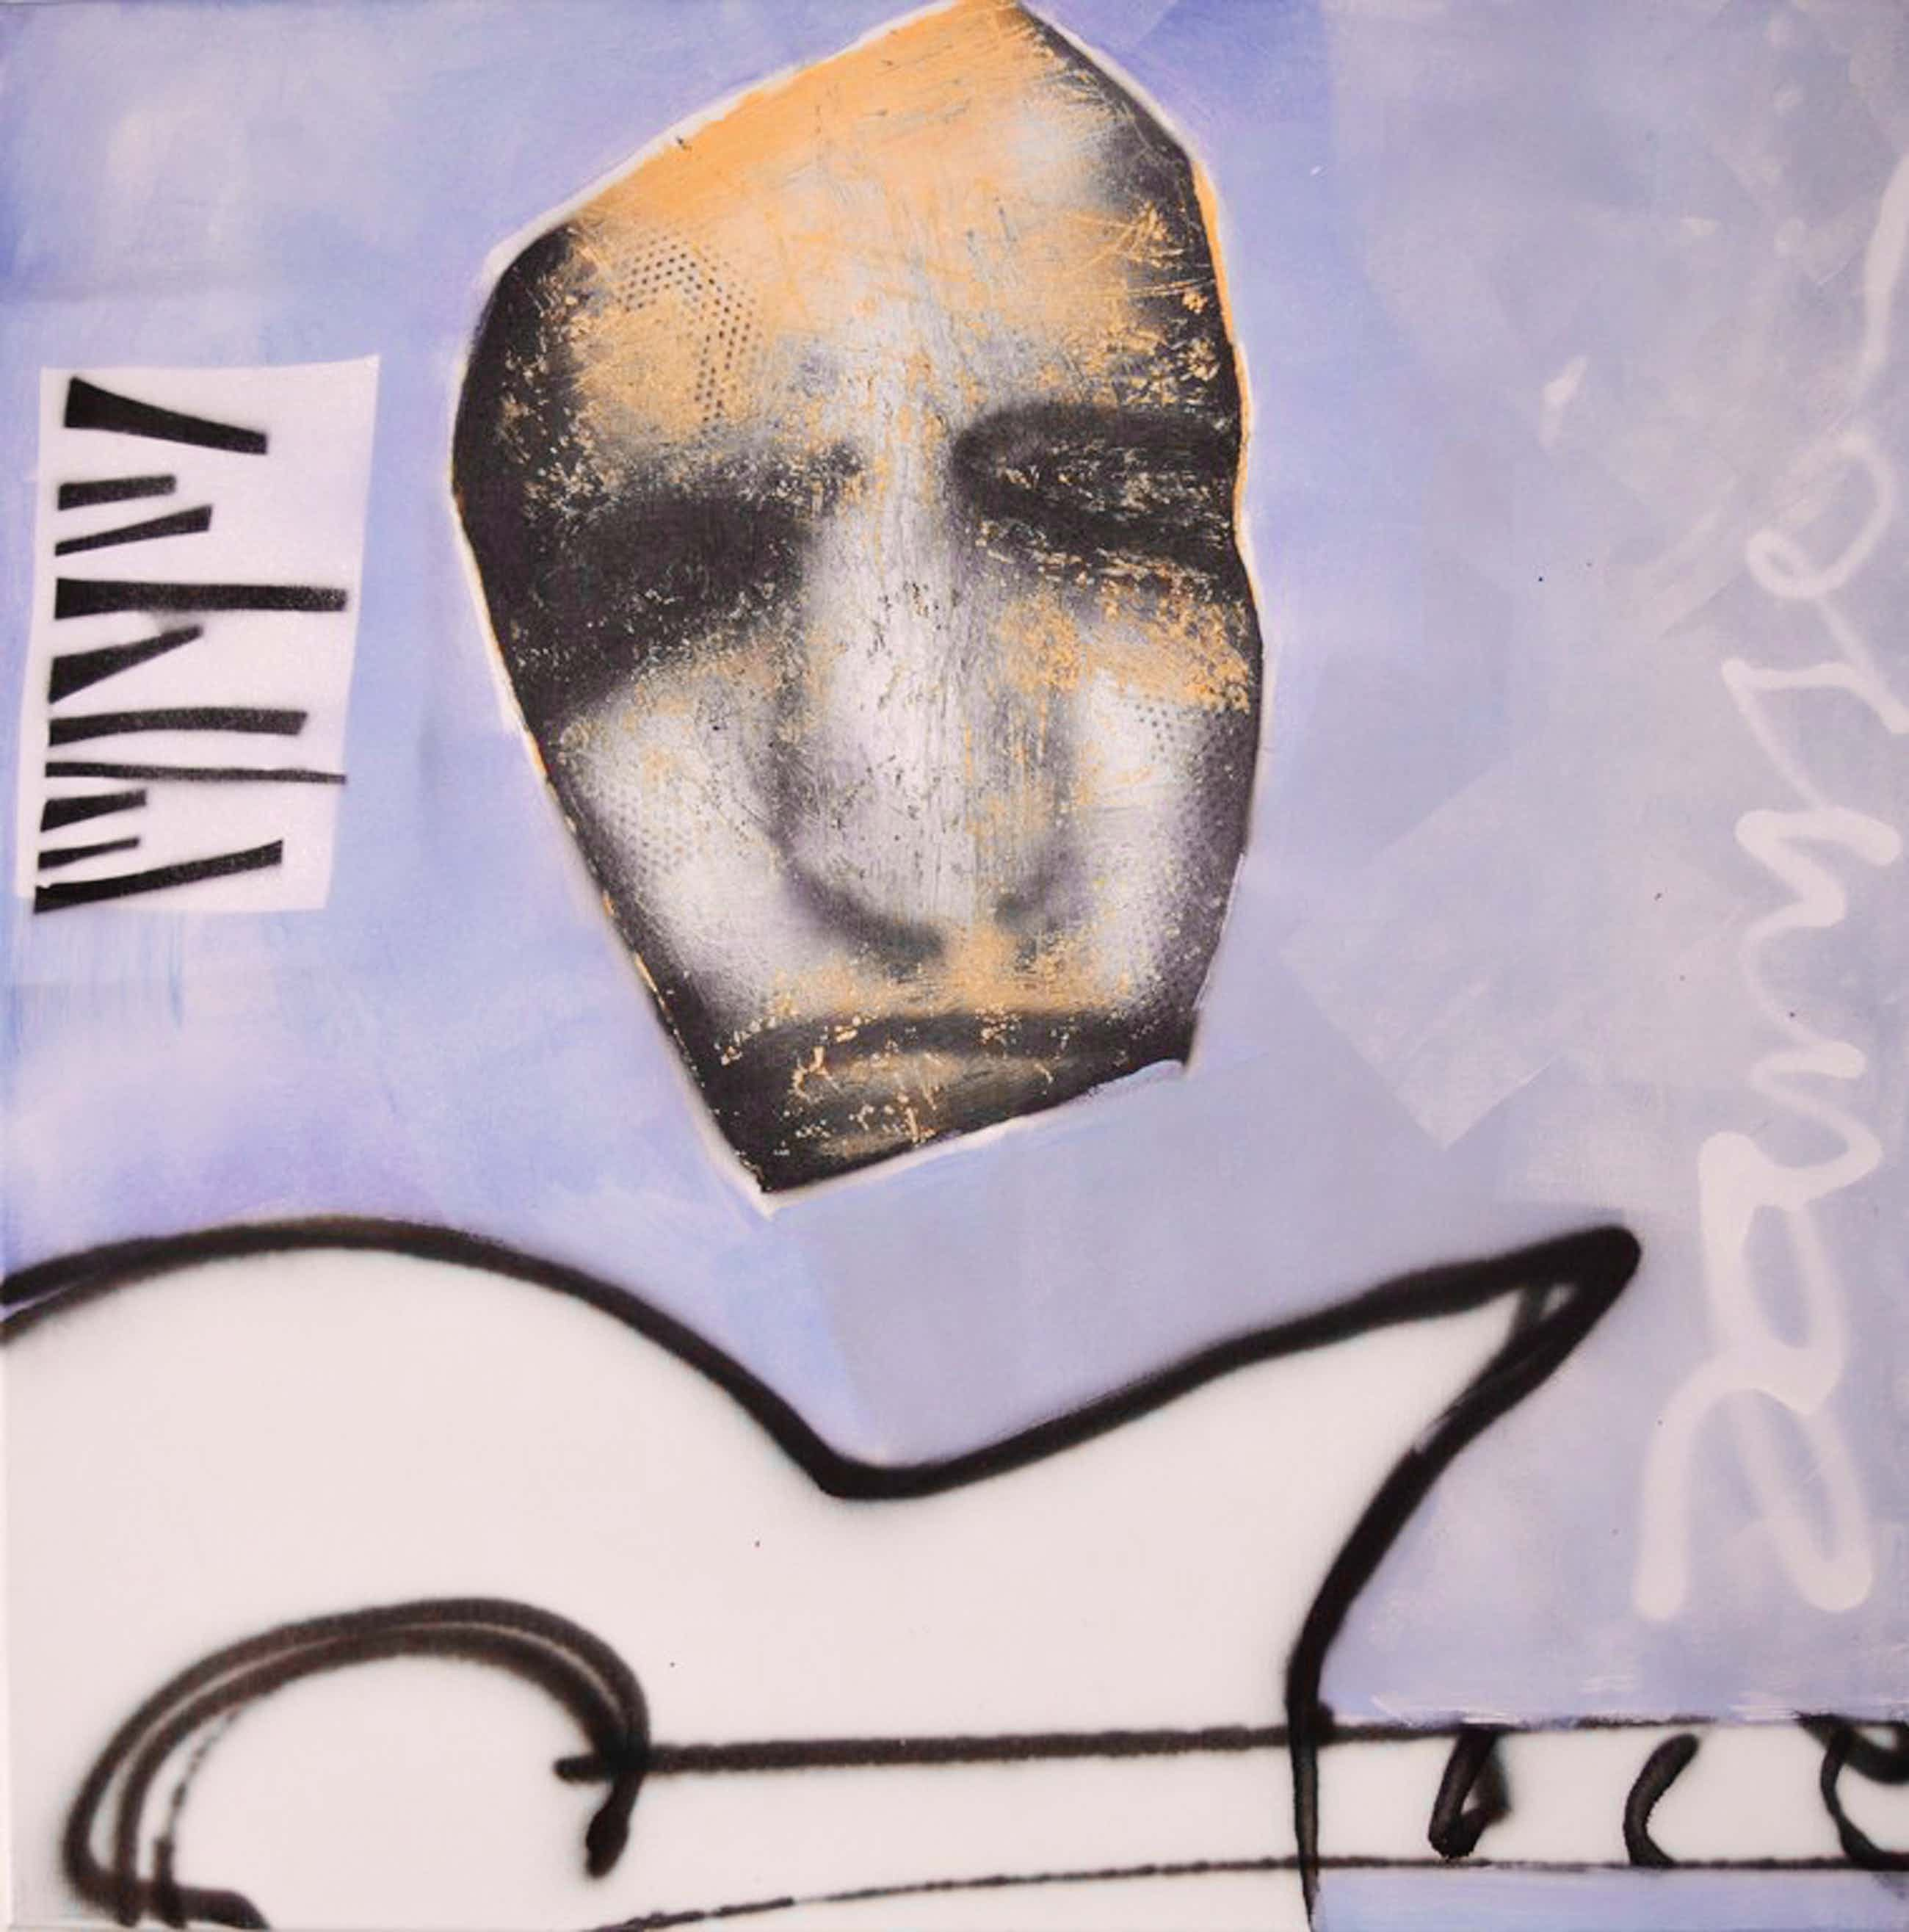 Edwin Janssen: Gitar guy - acryl en spuitbus - 2012 kopen? Bied vanaf 79!